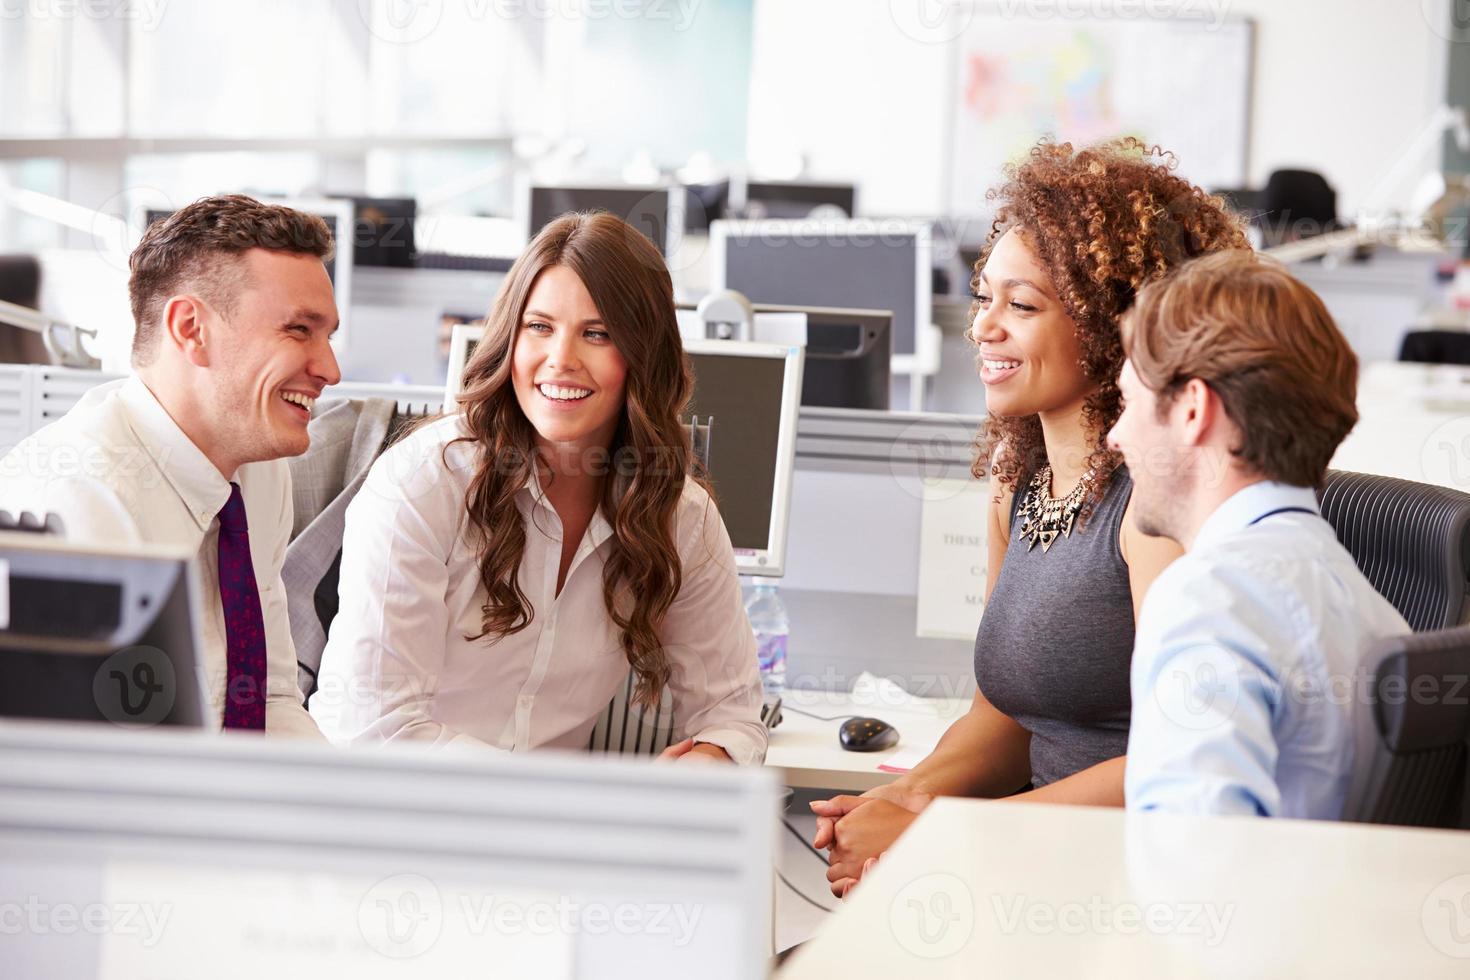 vier jonge kantoorcollega's in een informele teamvergadering foto